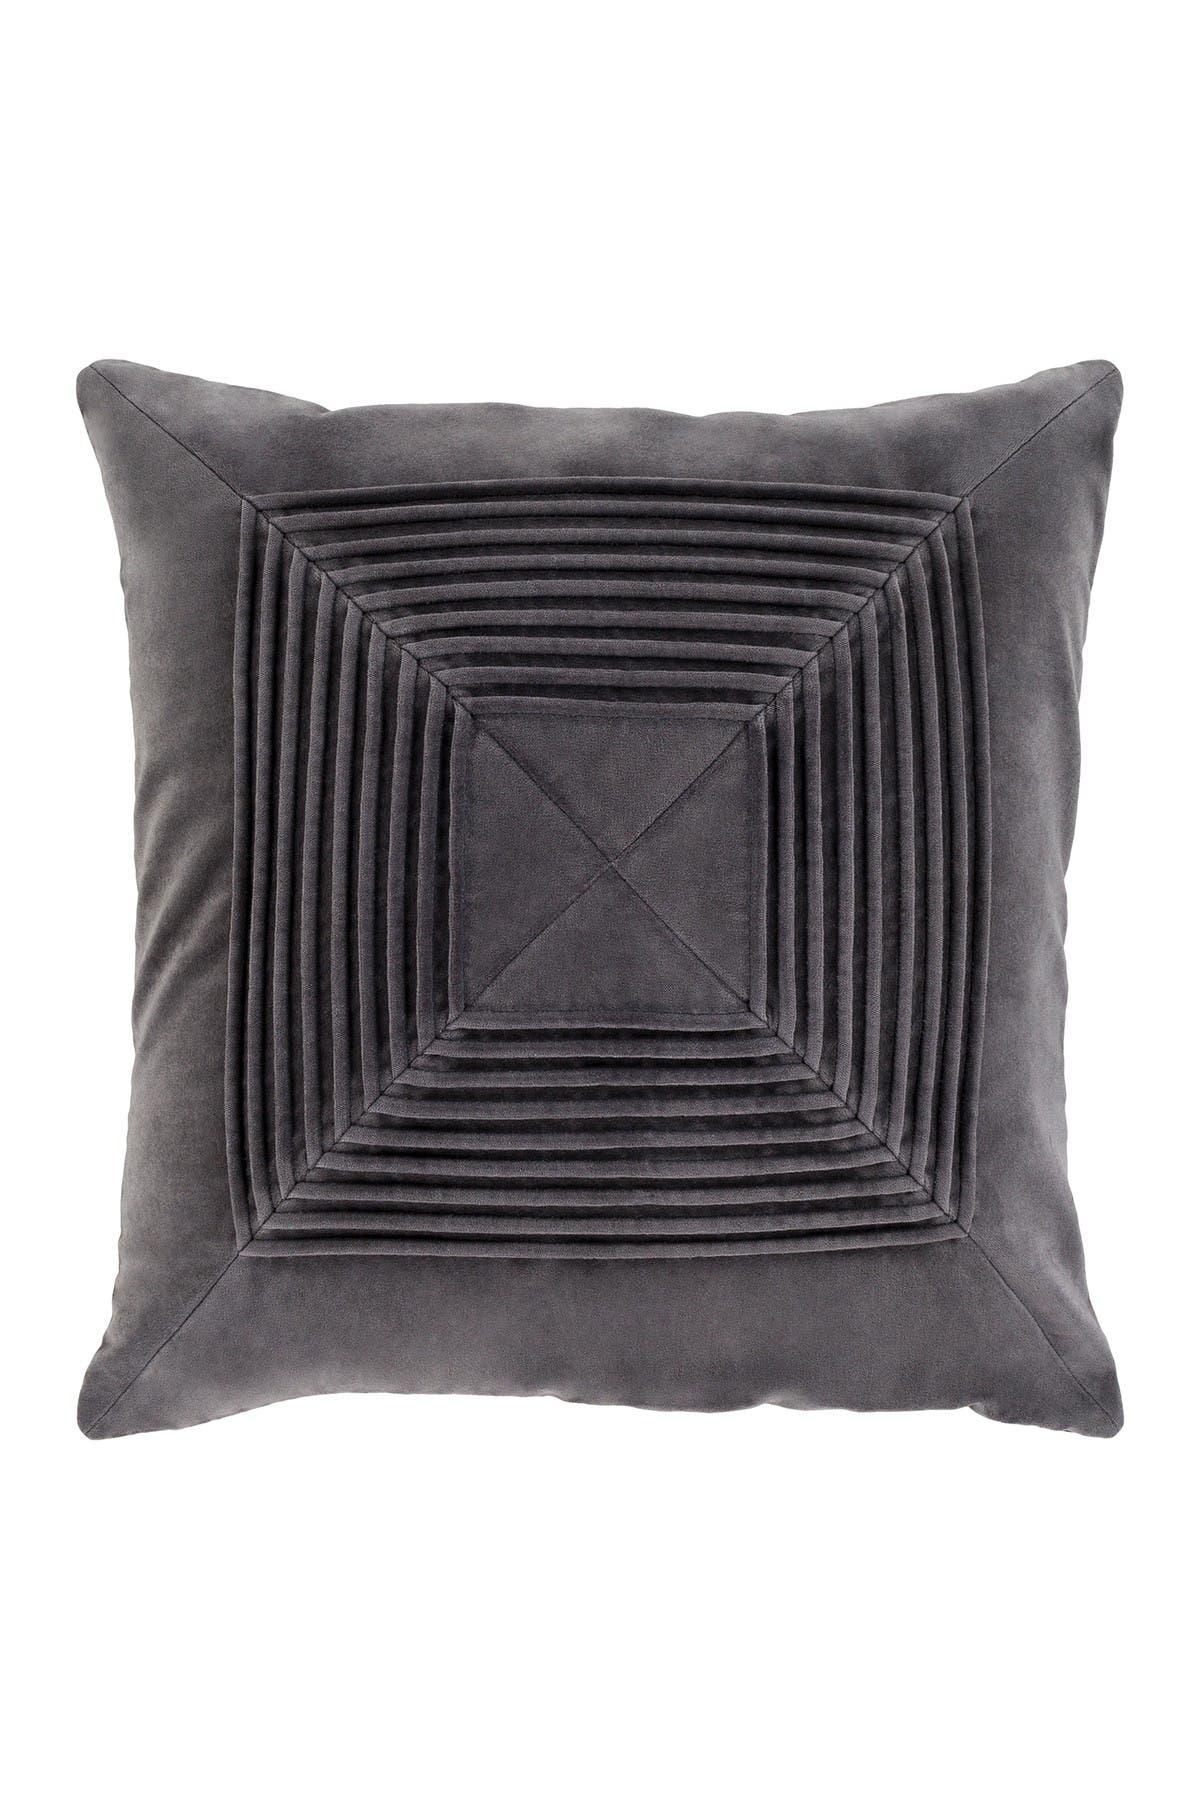 Image of SURYA HOME Charcoal Akira Texture Pillow